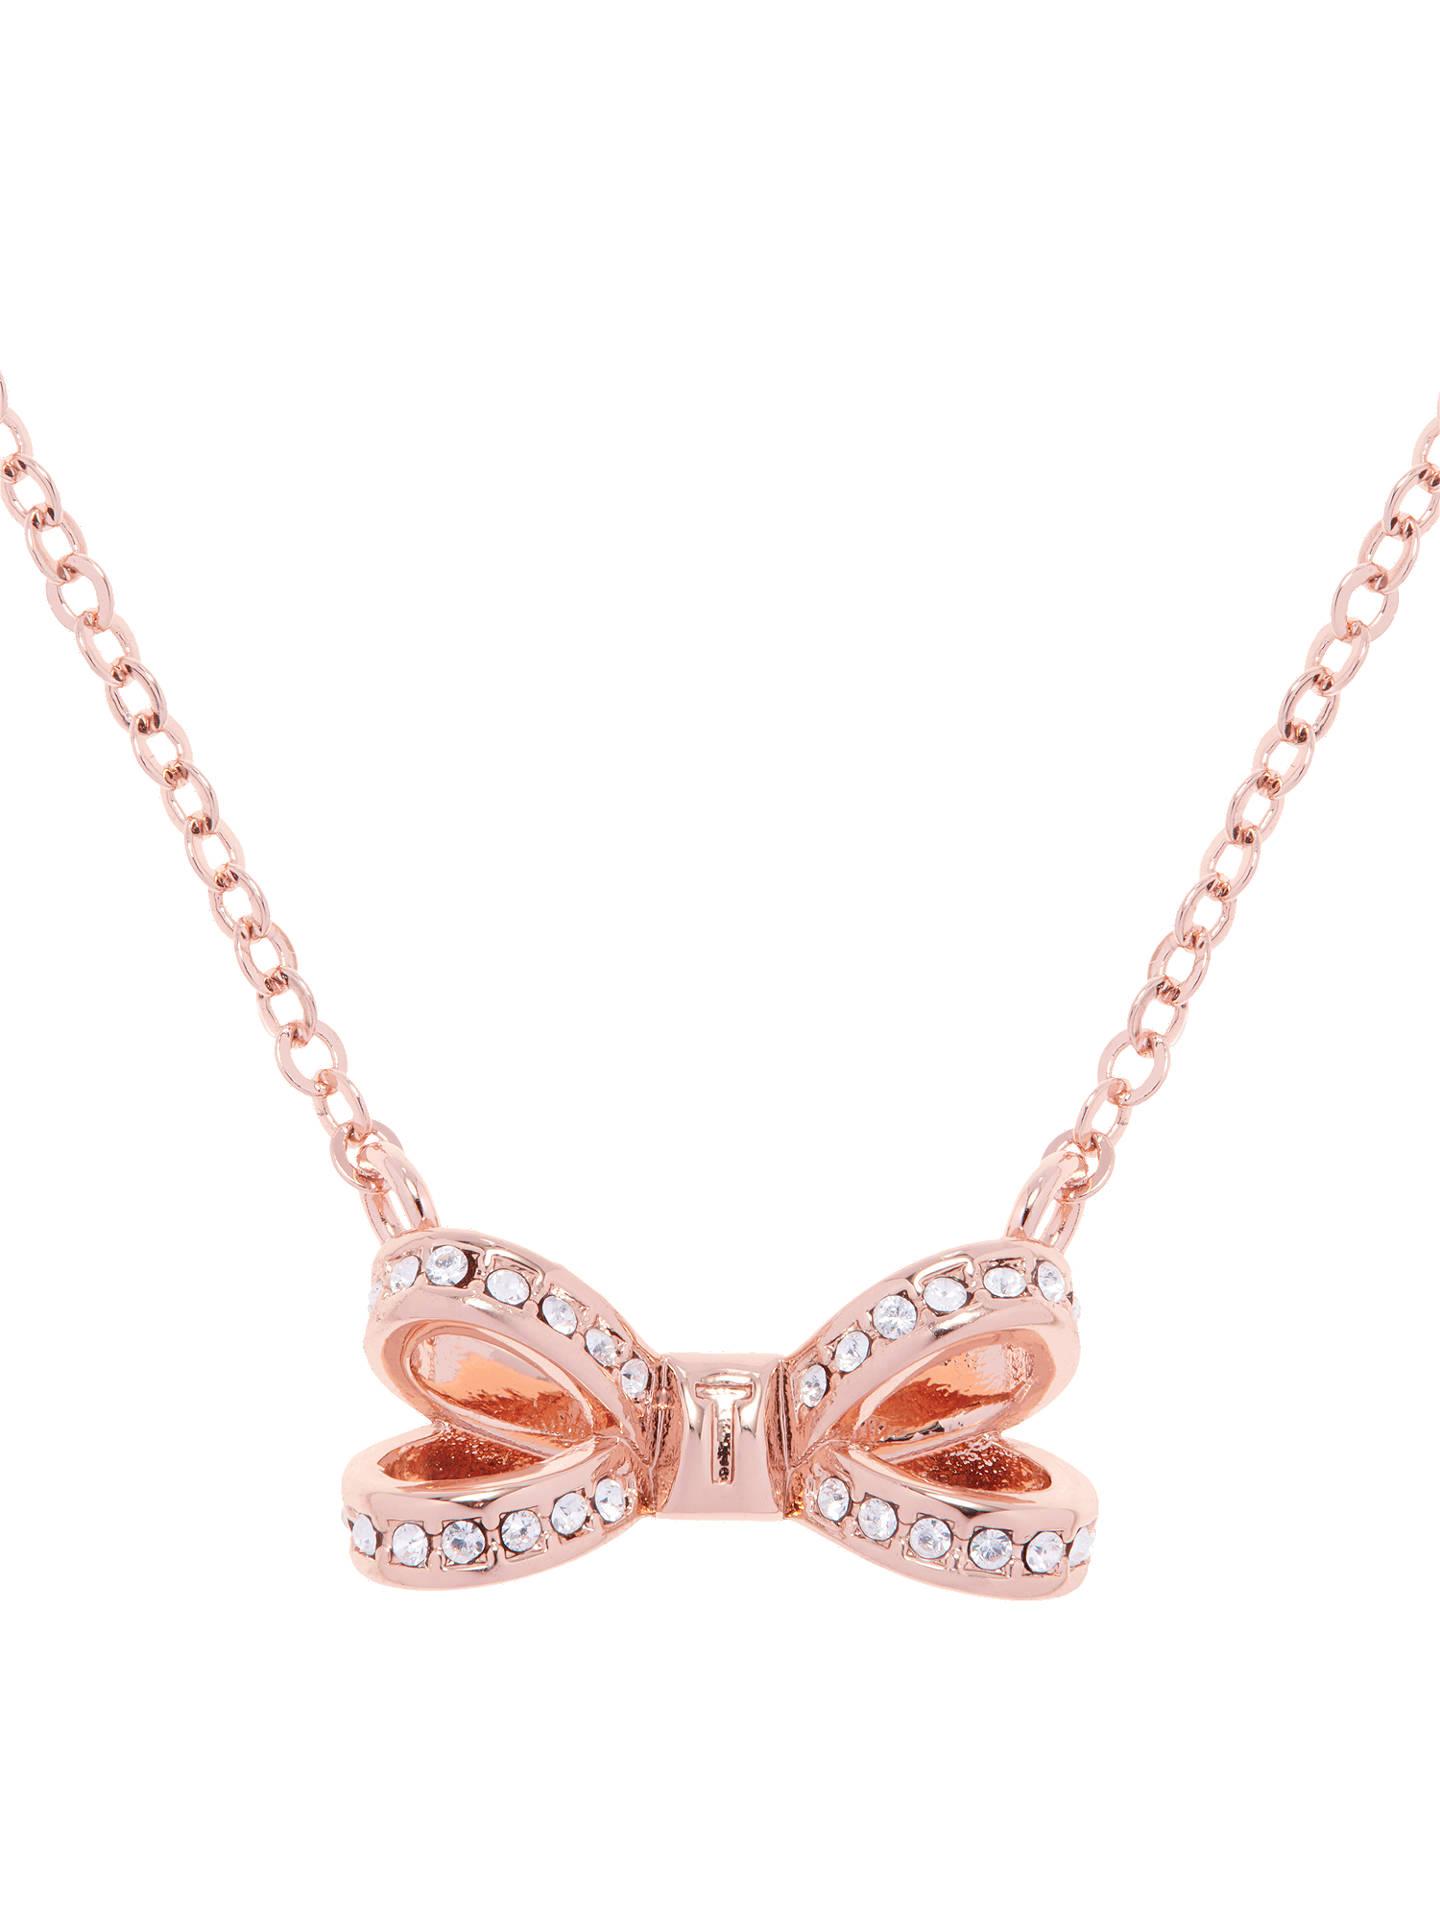 2f4df1dc0467 Buy Ted Baker Olira Swarovski Crystal Bow Pendant Necklace